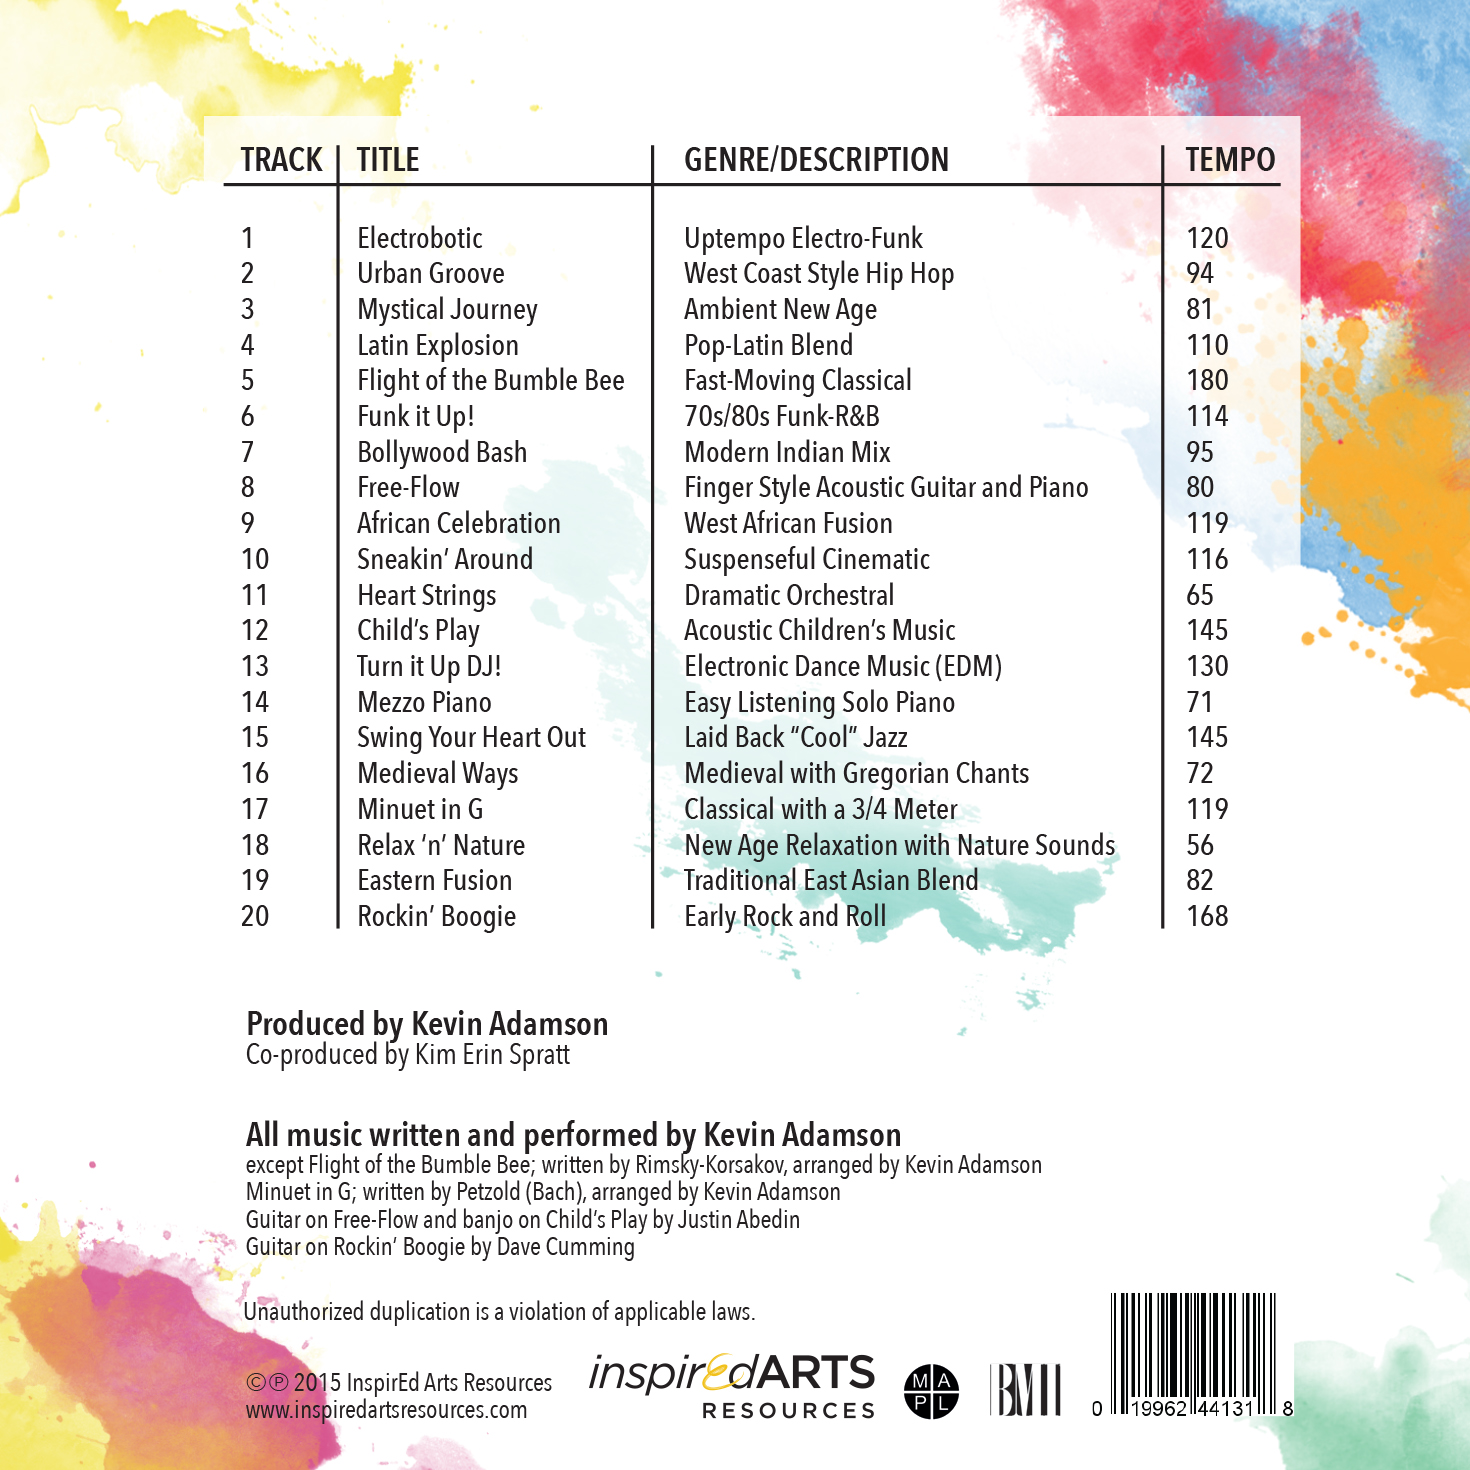 Music for Inspiration in Motion CD